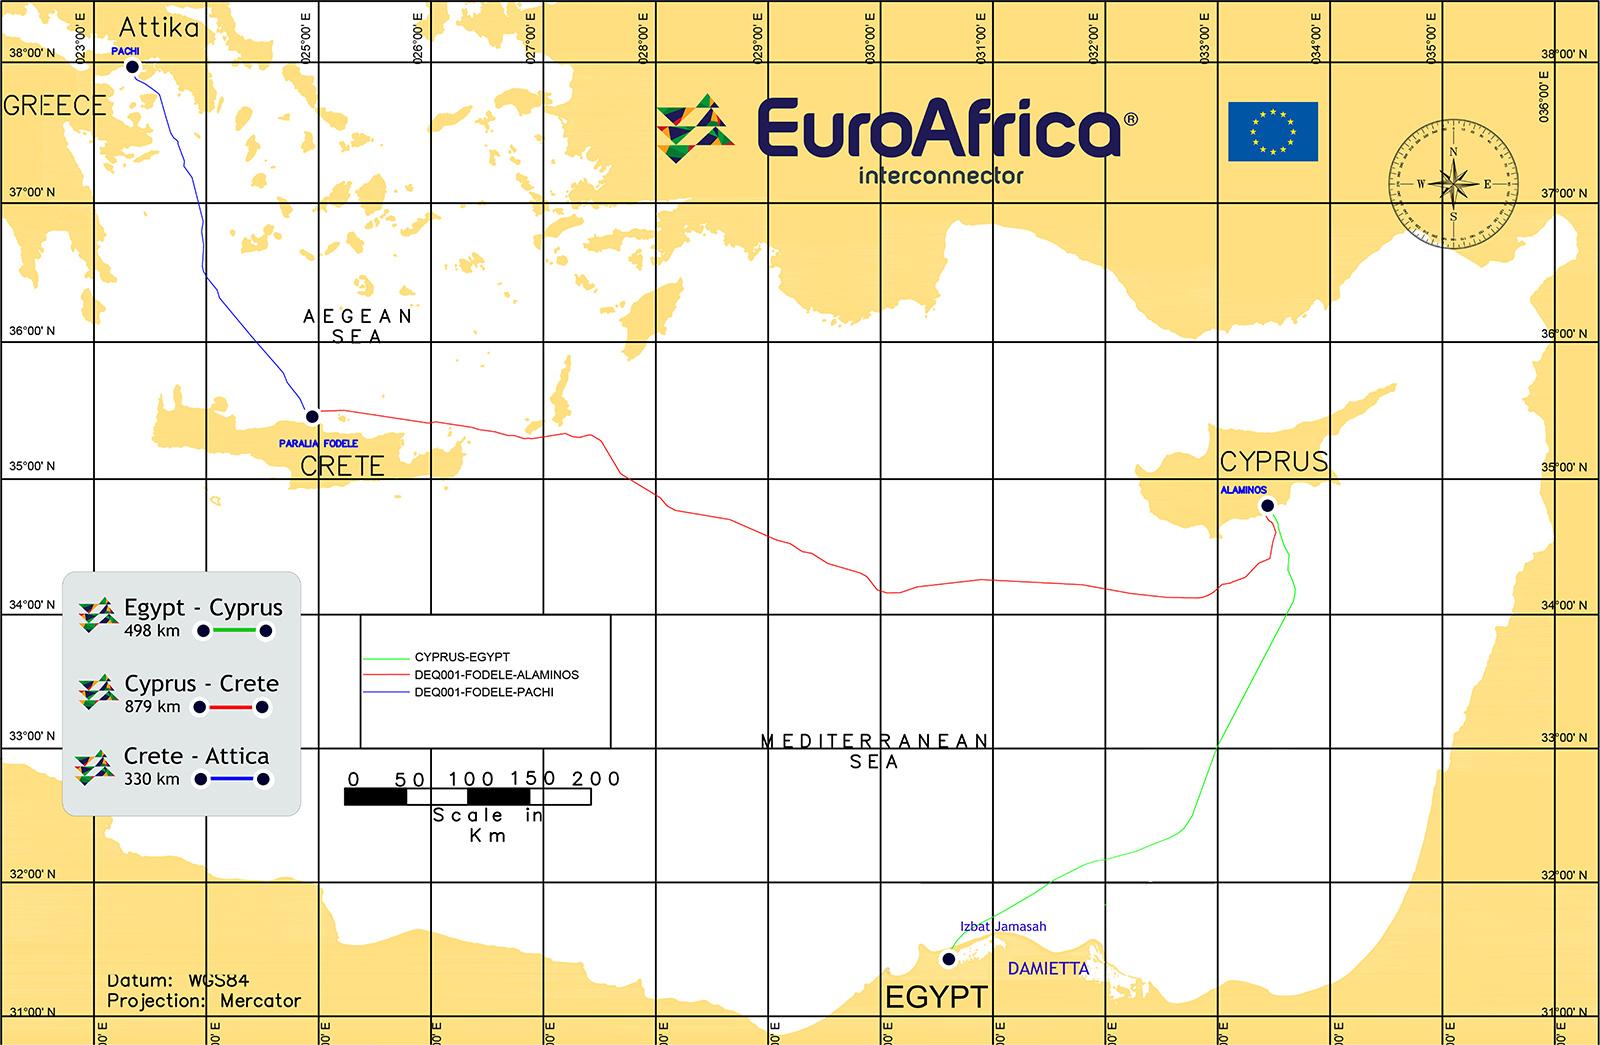 H Κύπρος είναι κέντρο για την μεταφορά ηλεκτρικής ενέργειας από την Αφρική προς την Ευρώπη